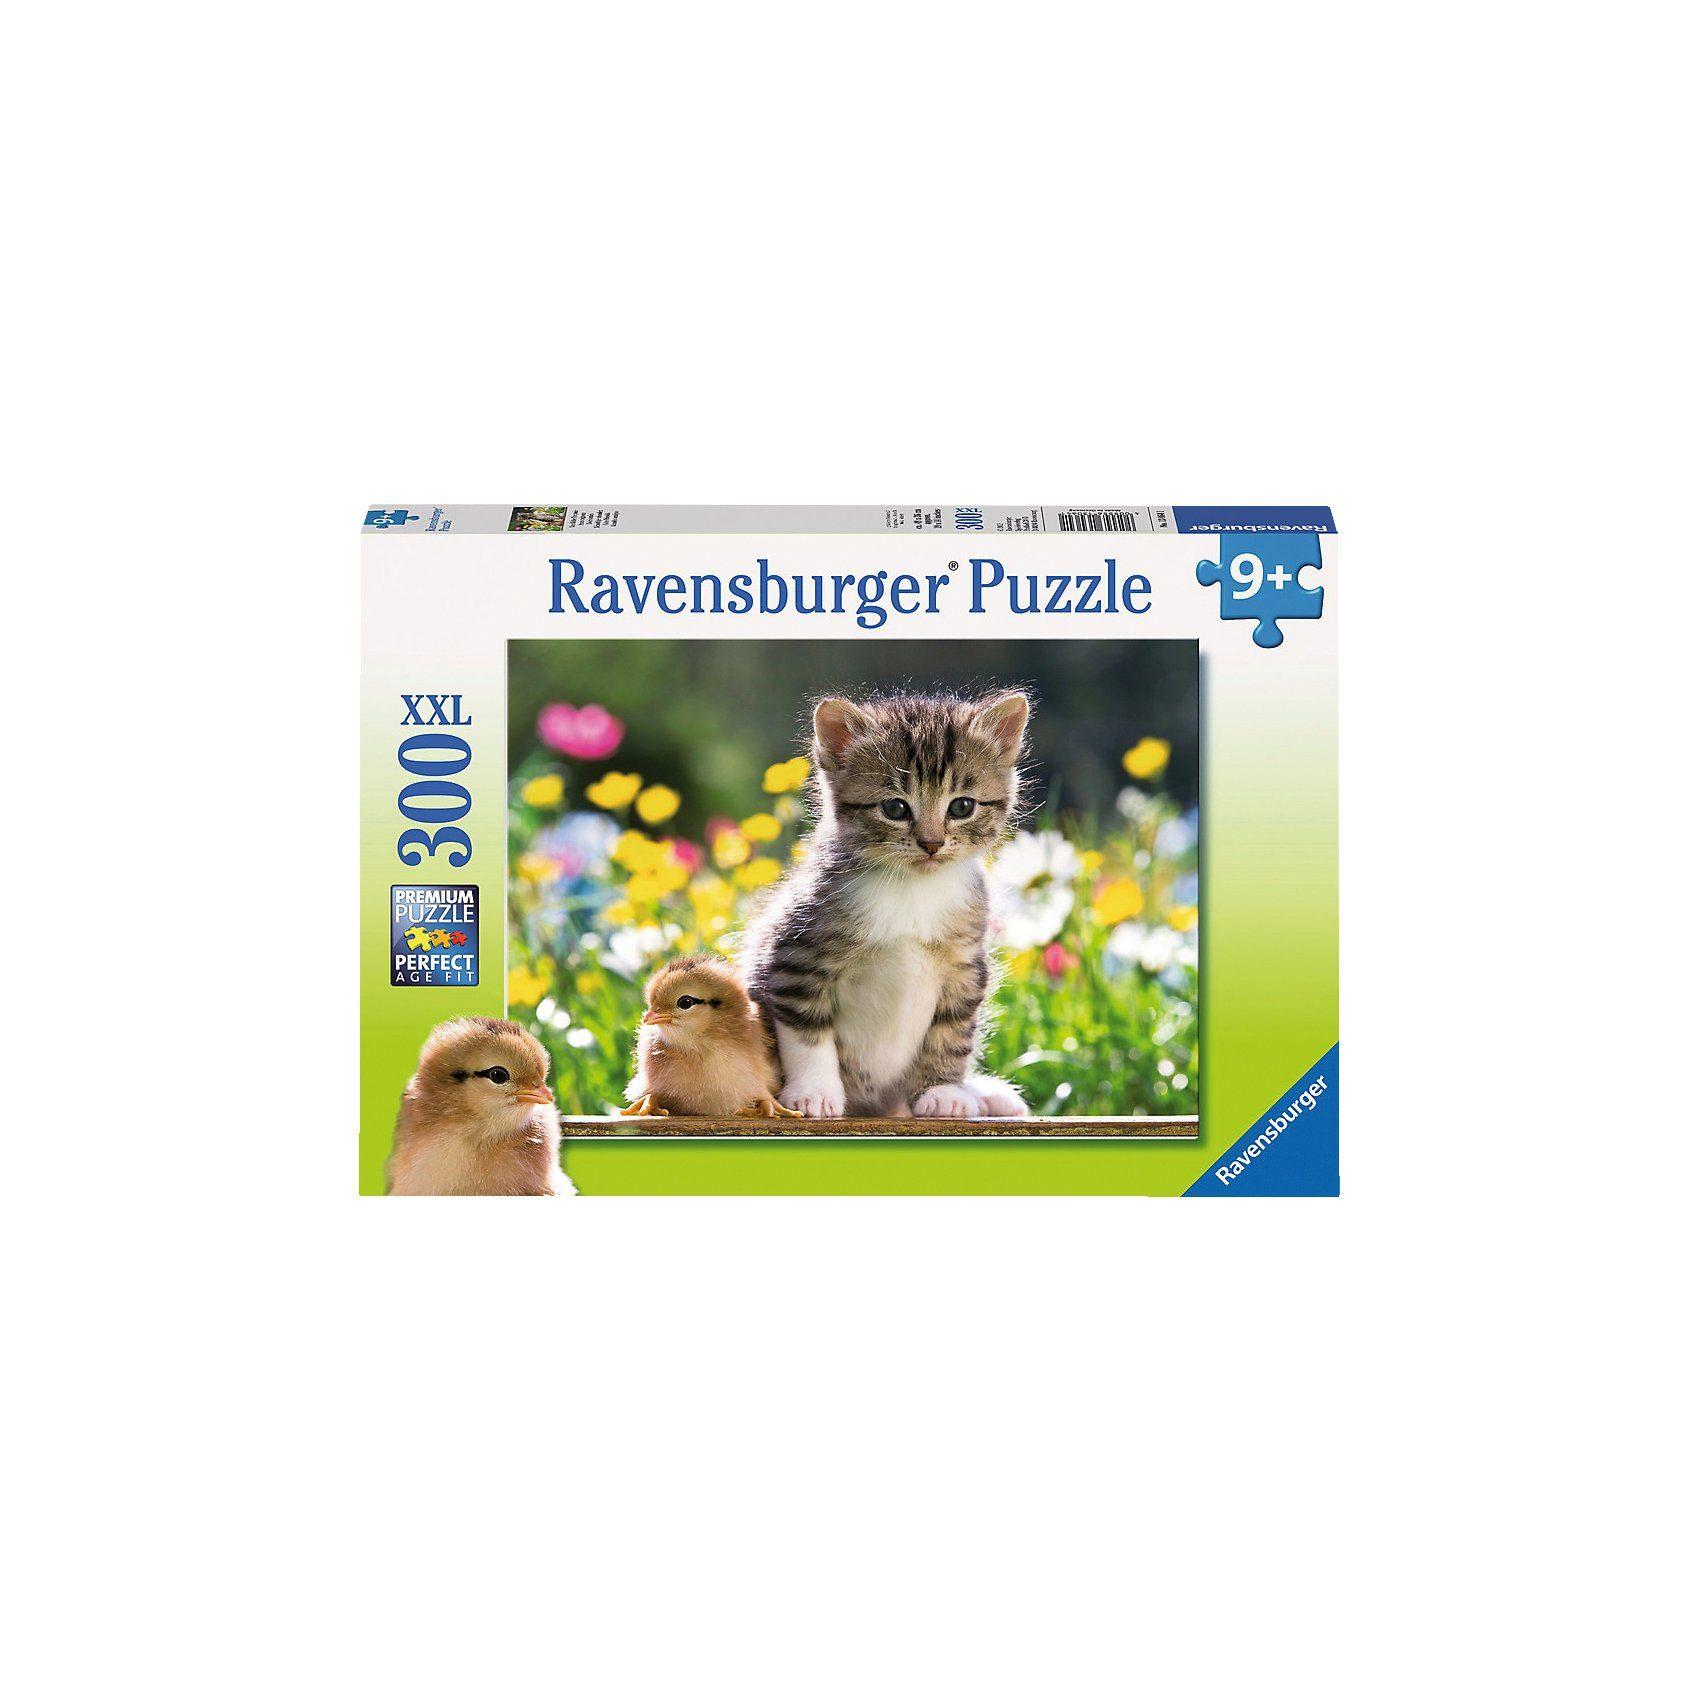 Ravensburger Puzzle Niedliche Freunde 300 Teile